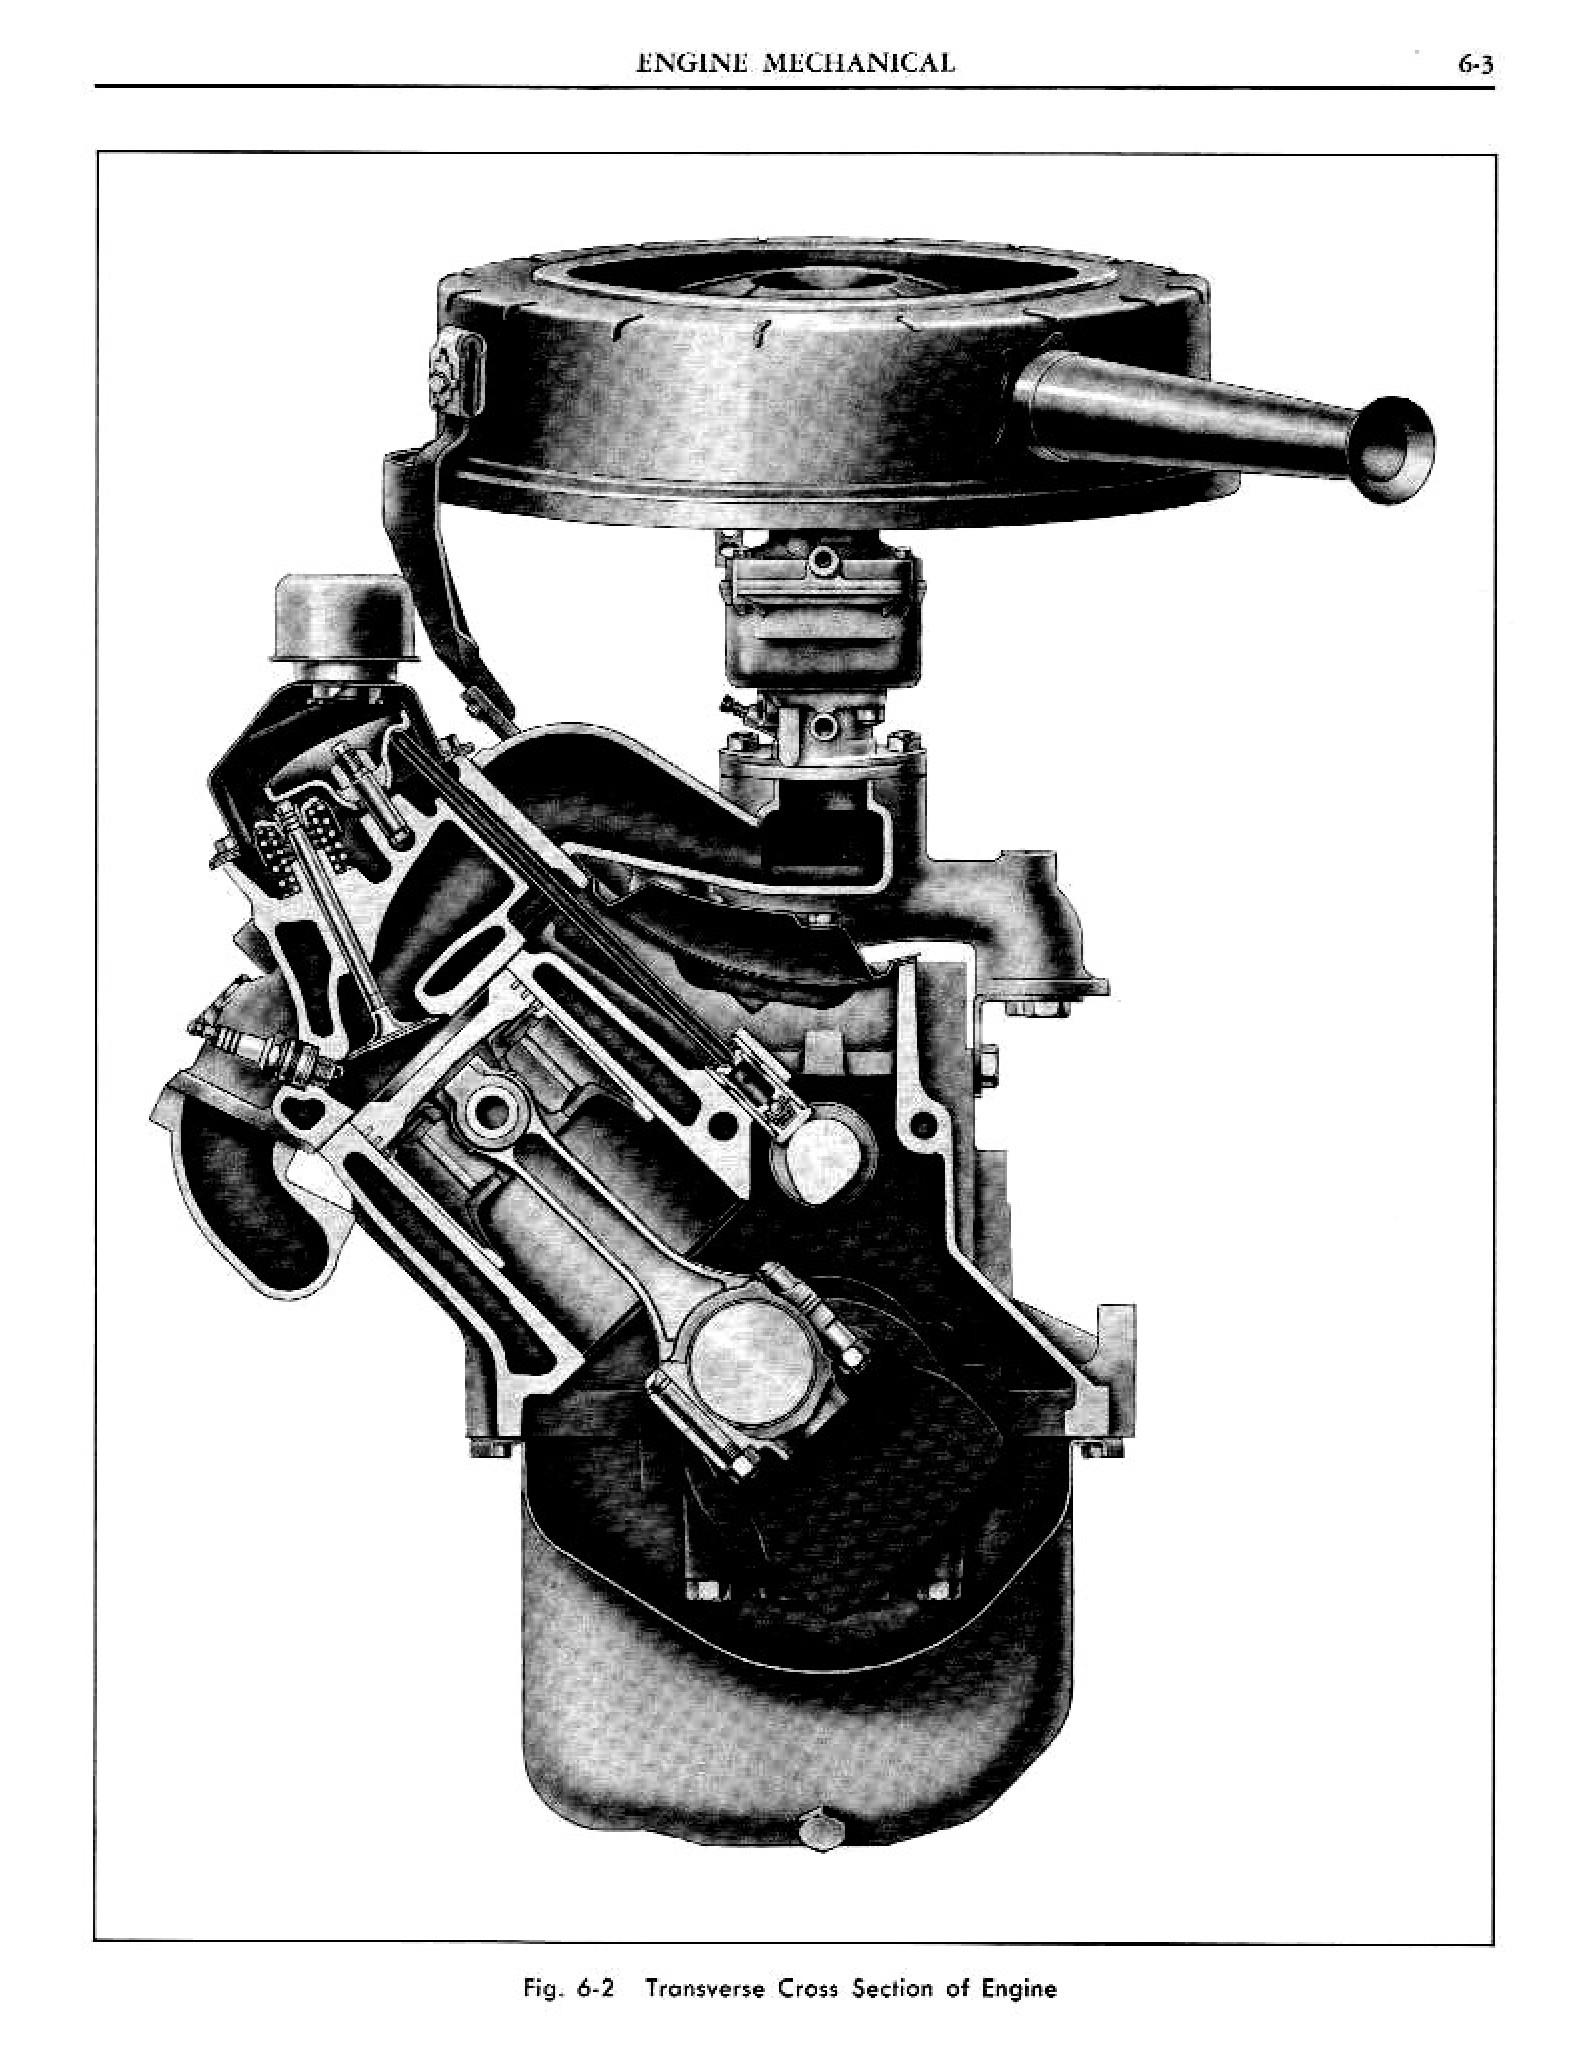 1961 Pontiac Tempest Shop Manual- Engine Page 3 of 71